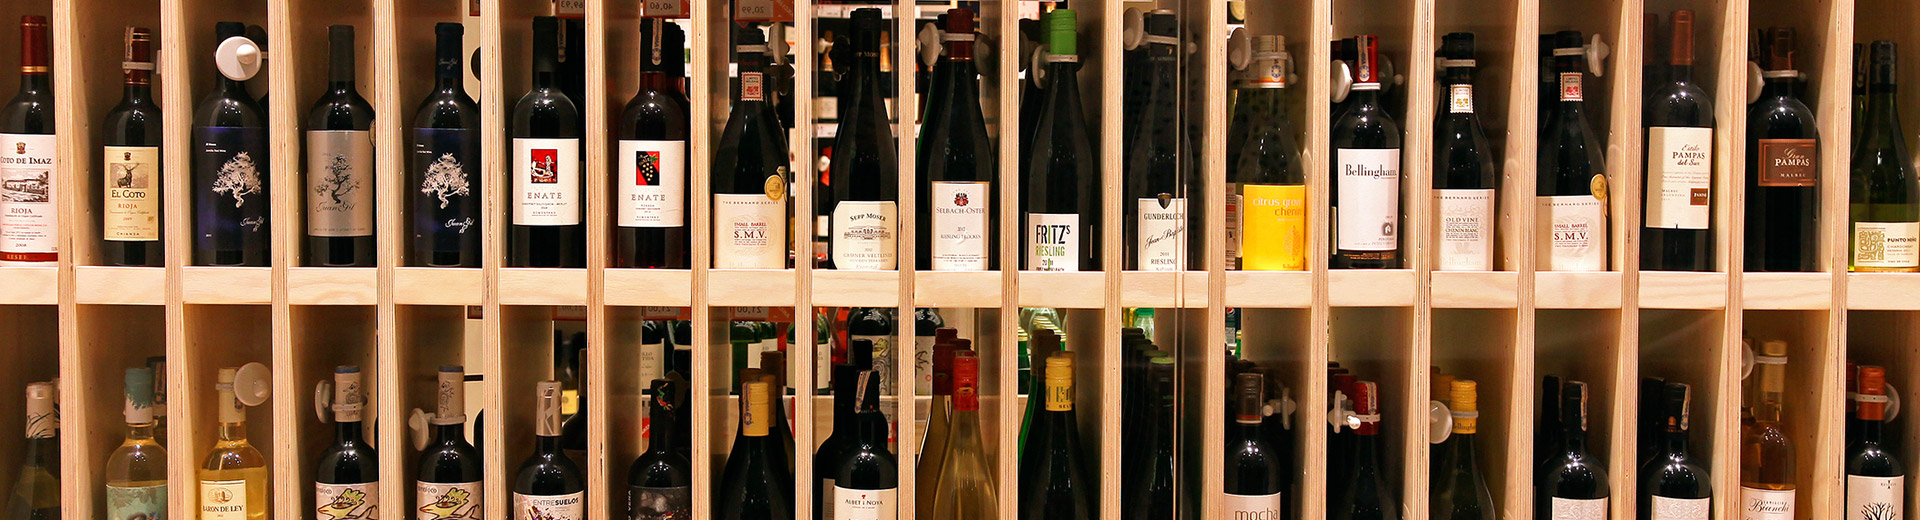 botellas_editada